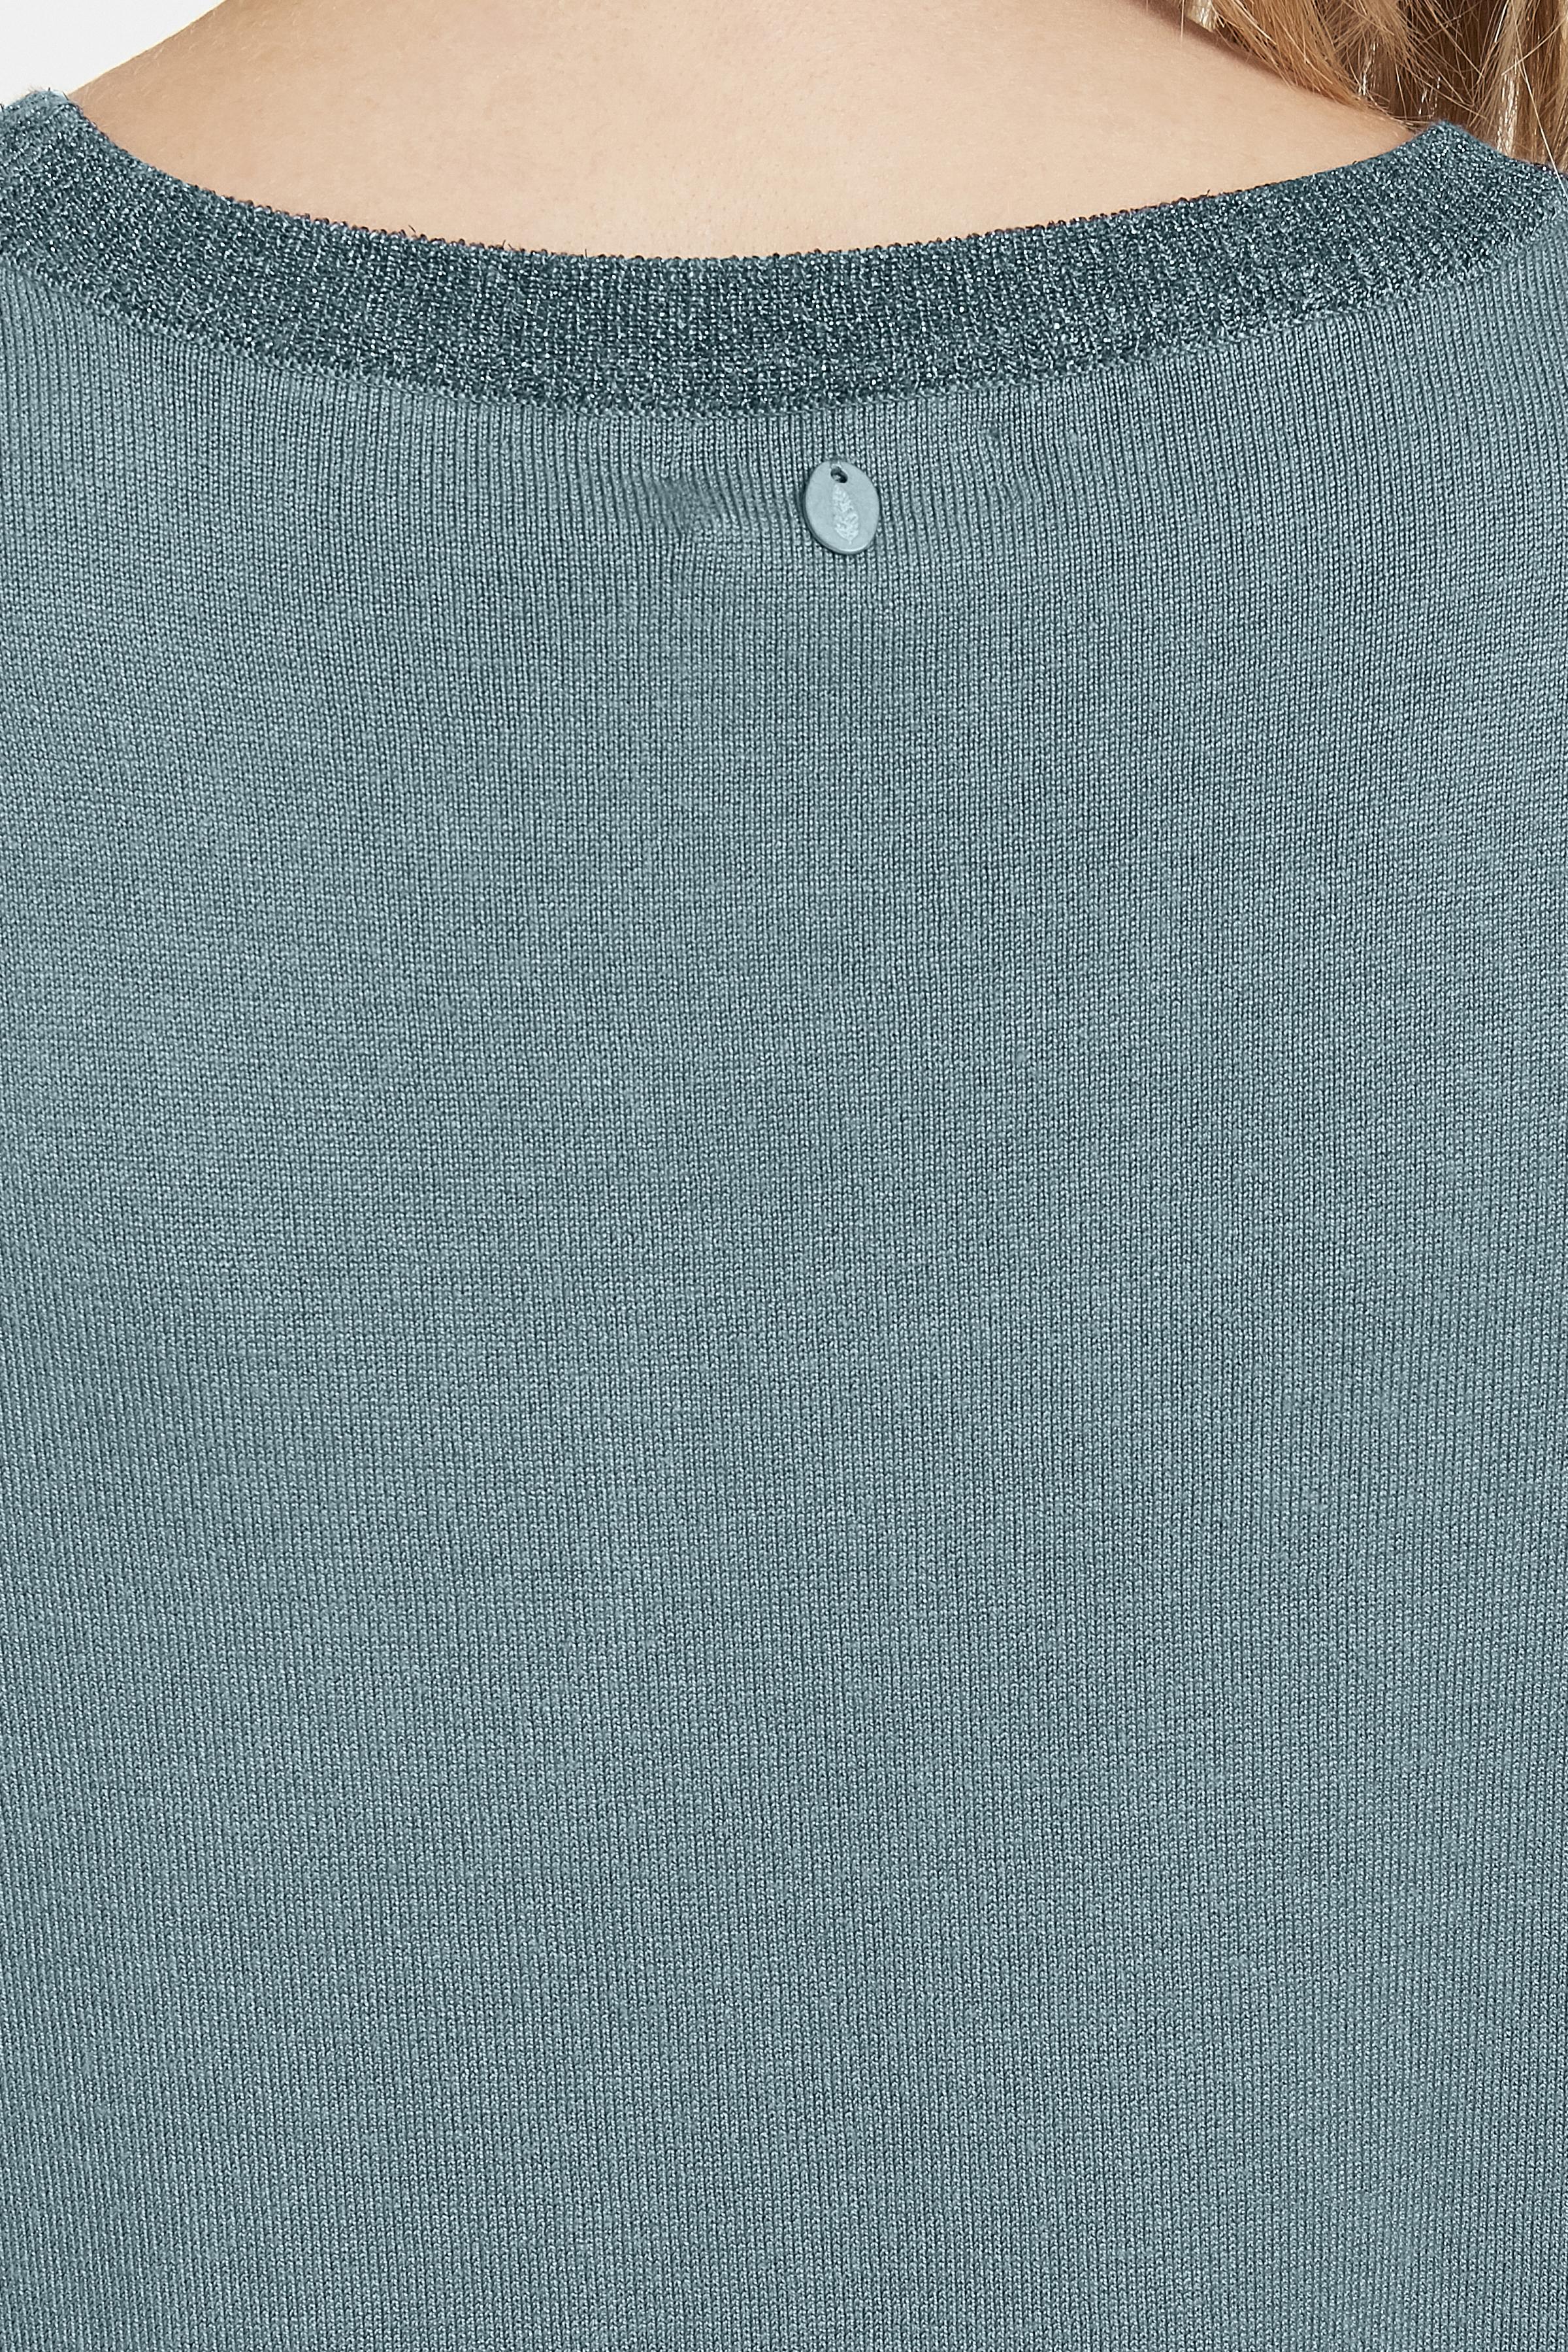 Støvet blå Striktunika fra Bon'A Parte – Køb Støvet blå Striktunika fra str. S-2XL her